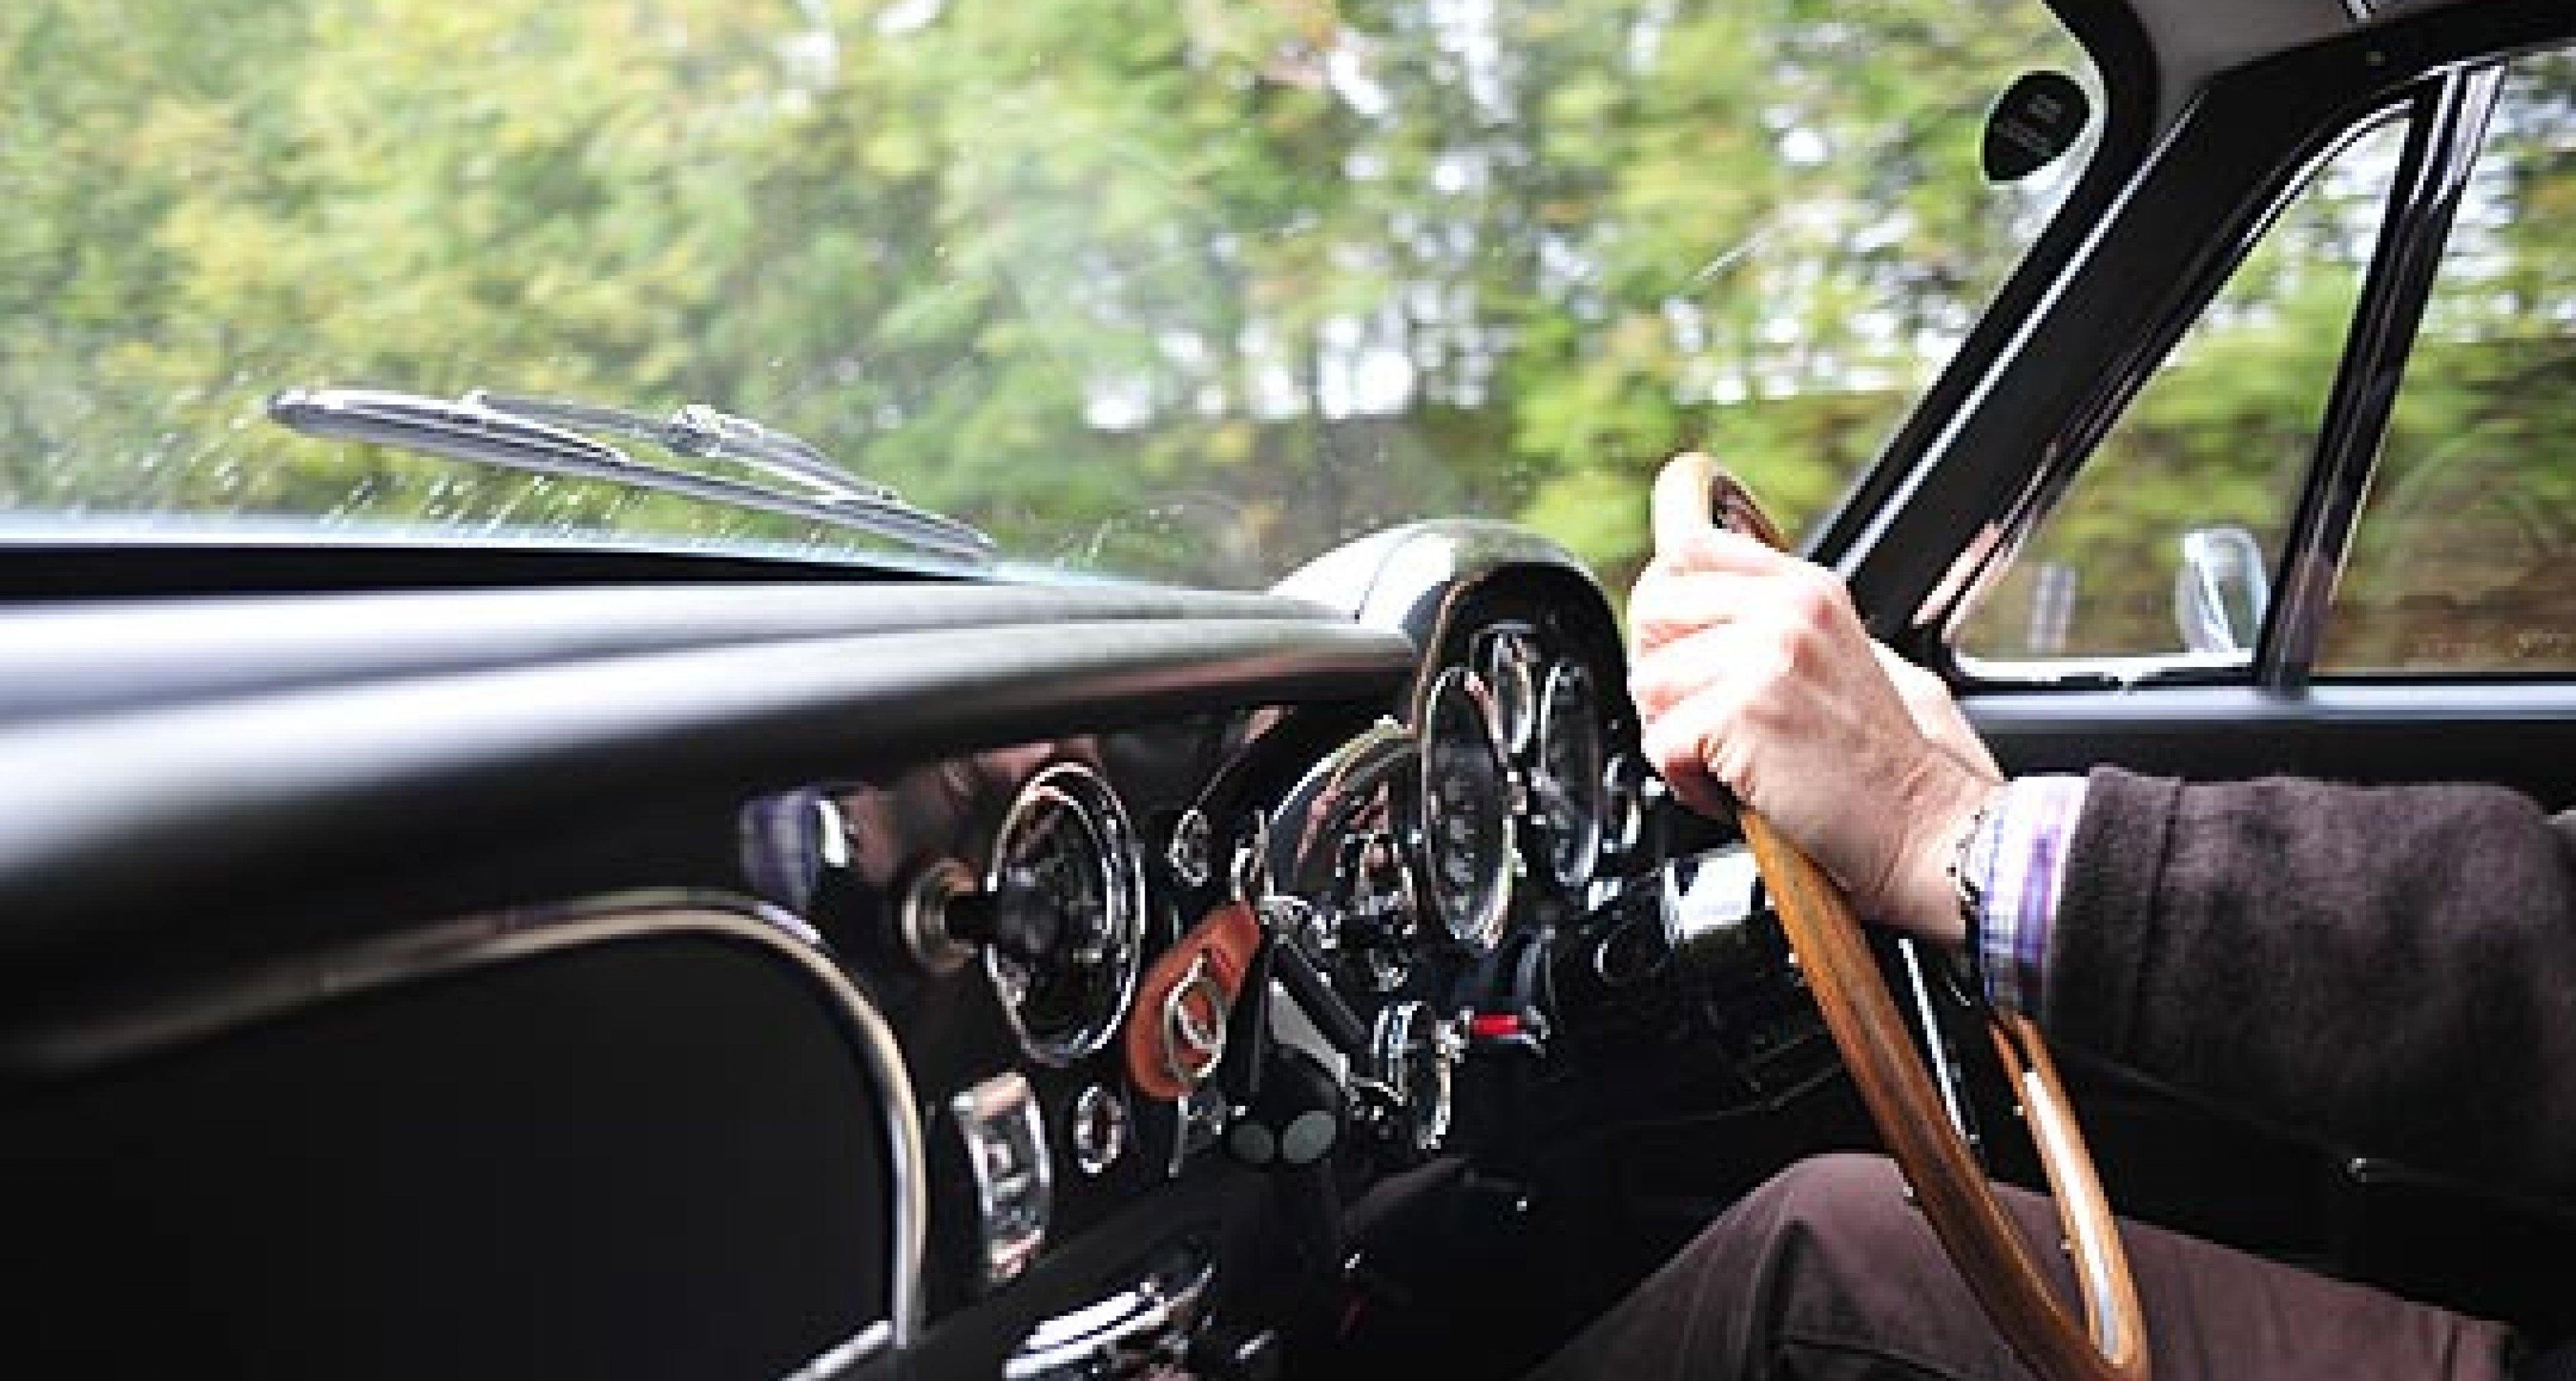 Aston Martin Works Service: 'Exceptional Treatment'